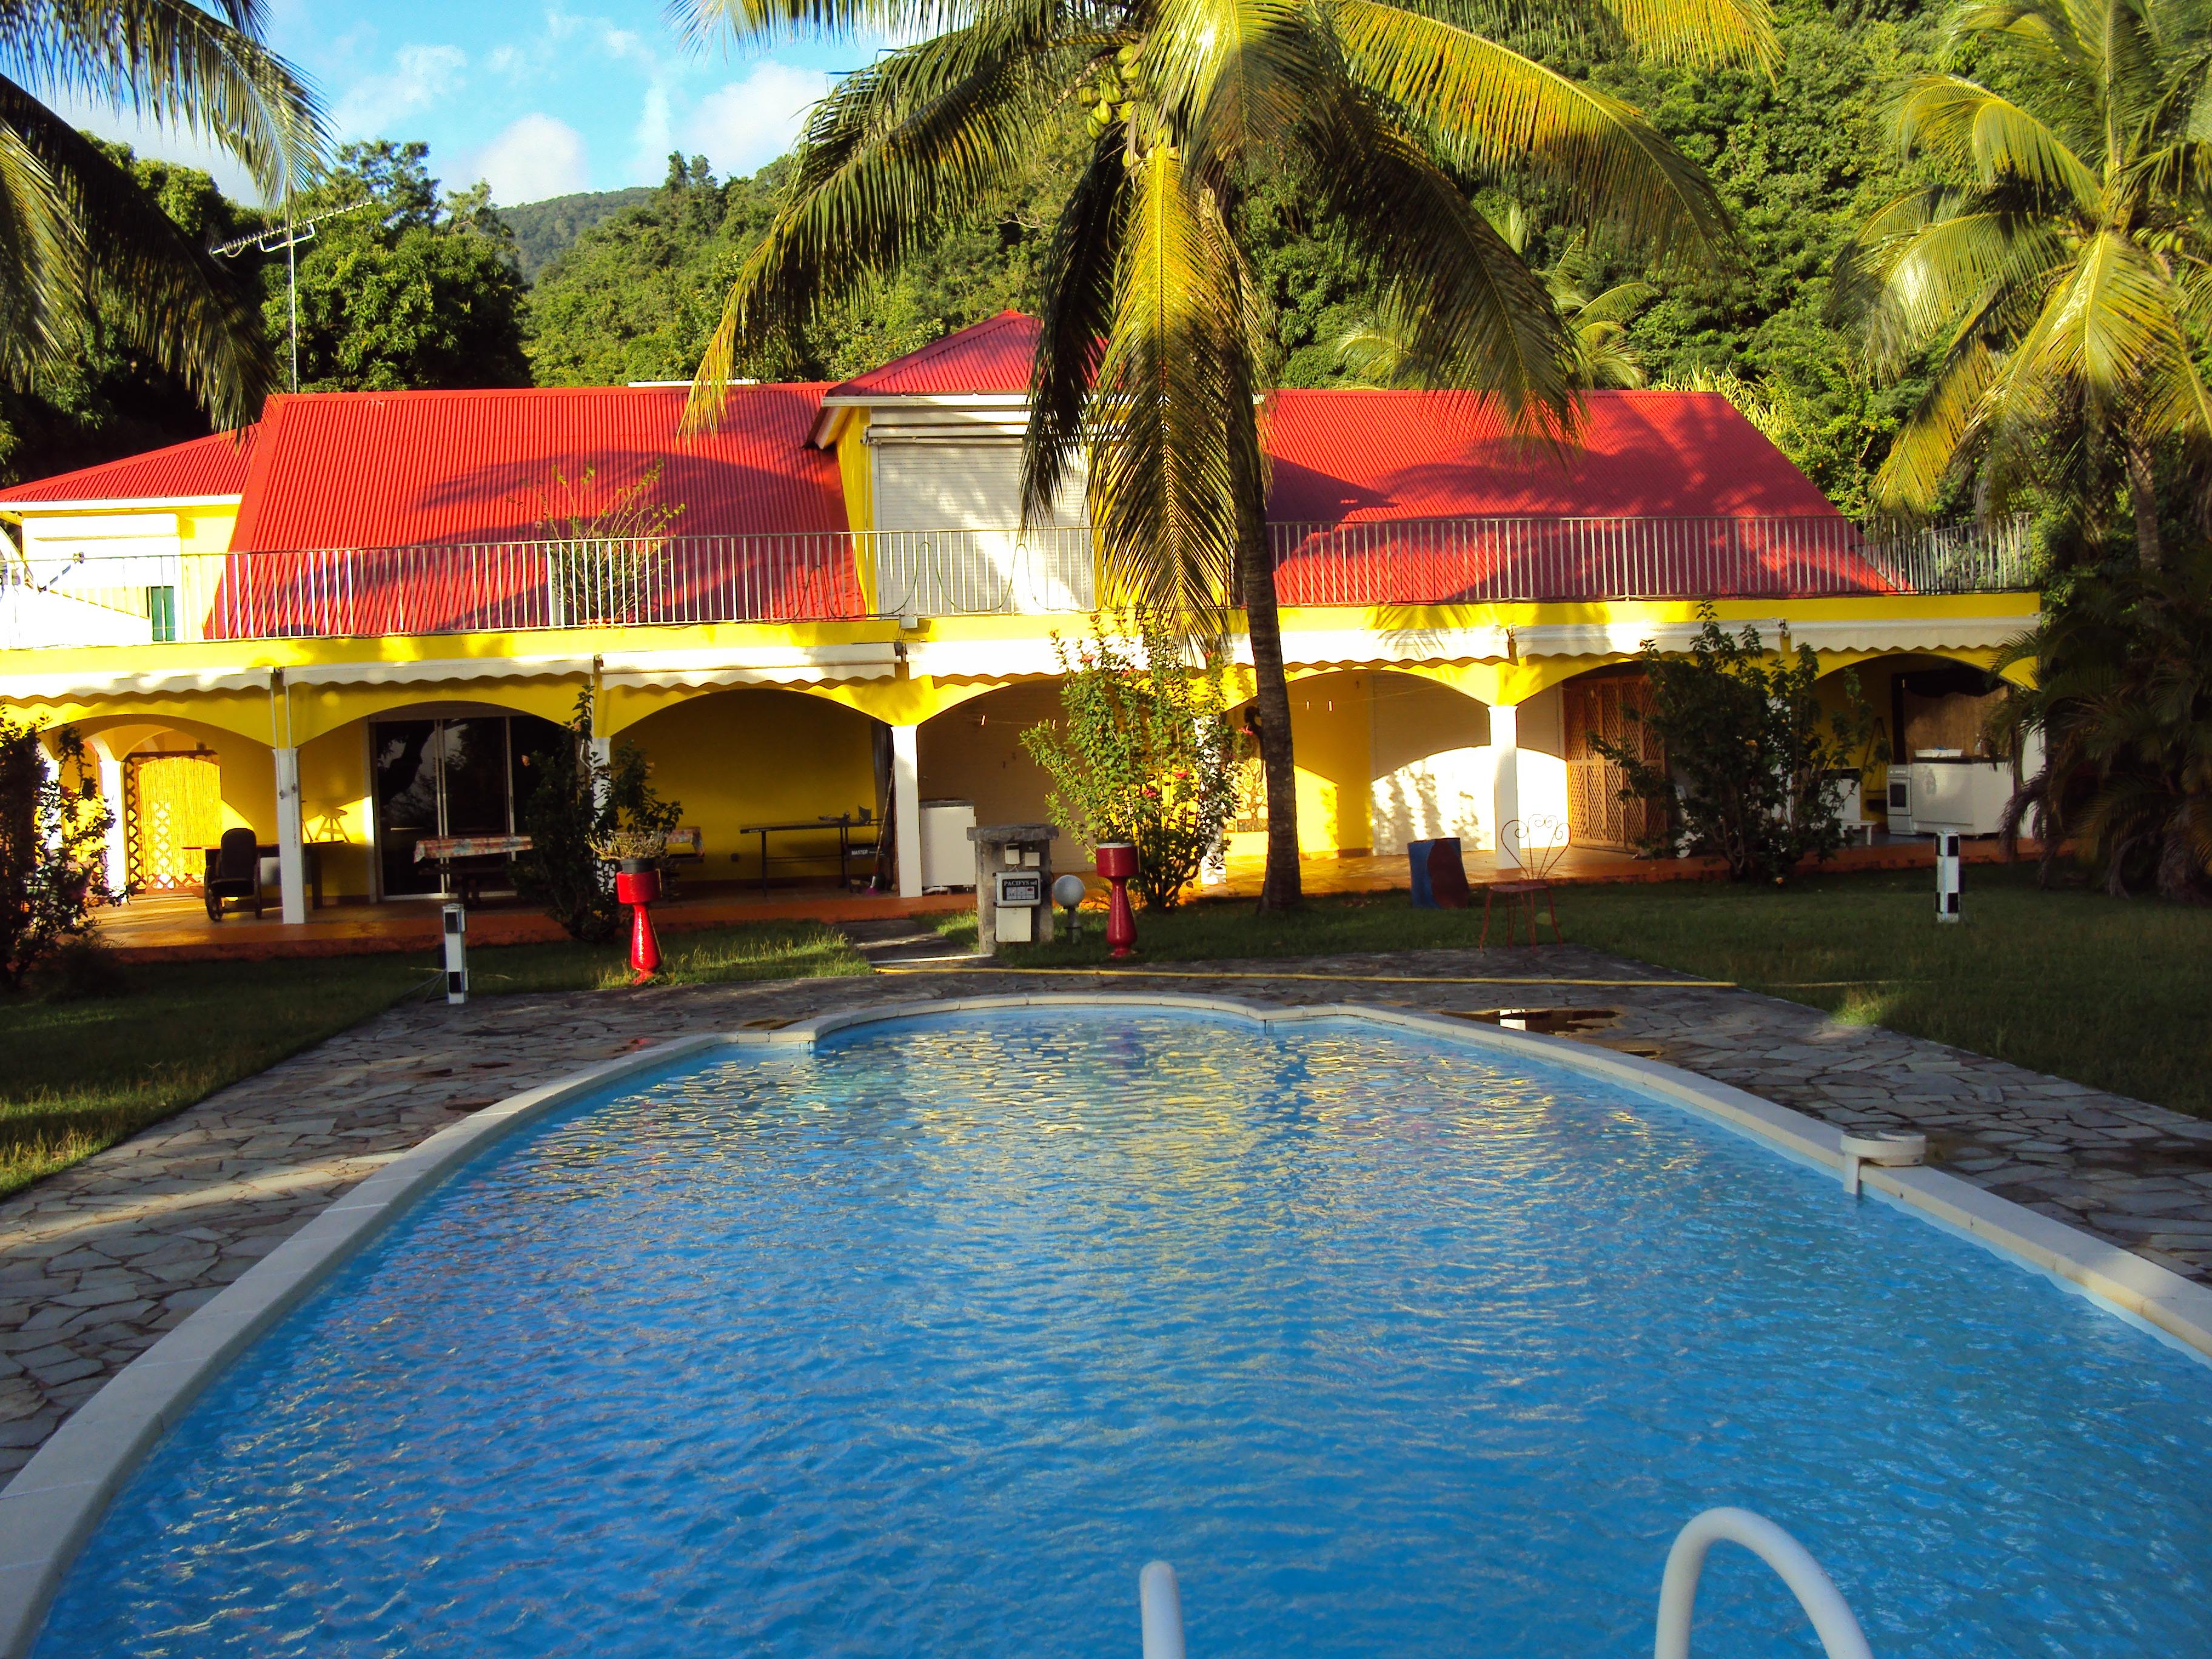 Guadeloupe Paradisio 2-3 *